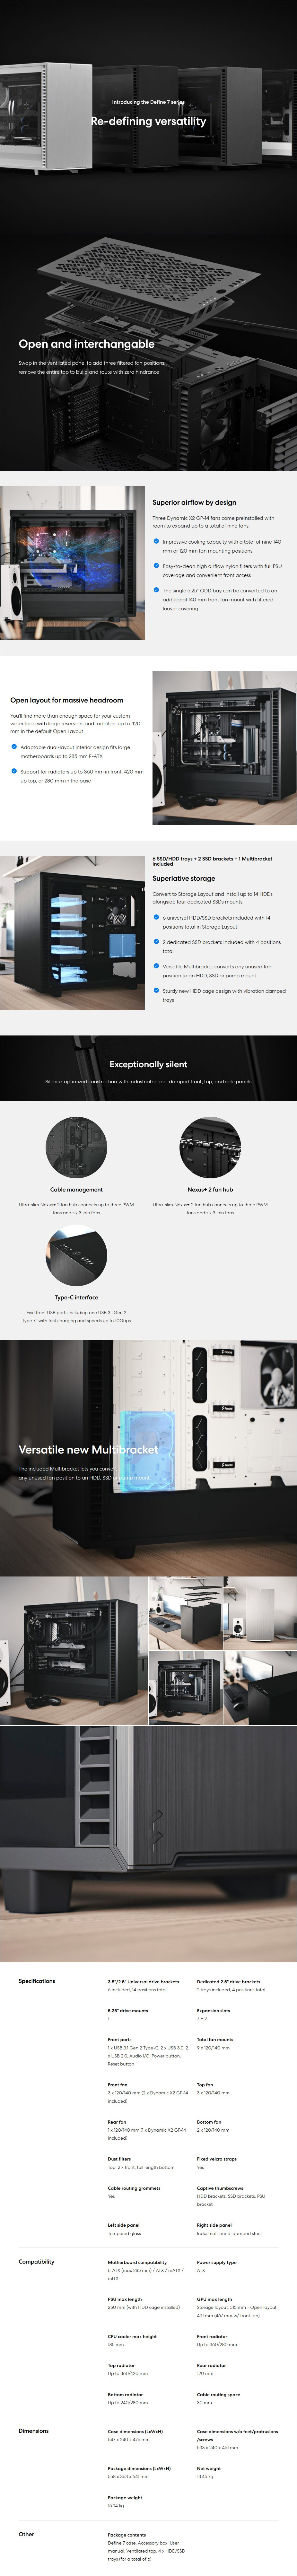 fractal-design-define-7-light-tempaered-glass-midtower-eatx-case-black-ac32562-12.jpg